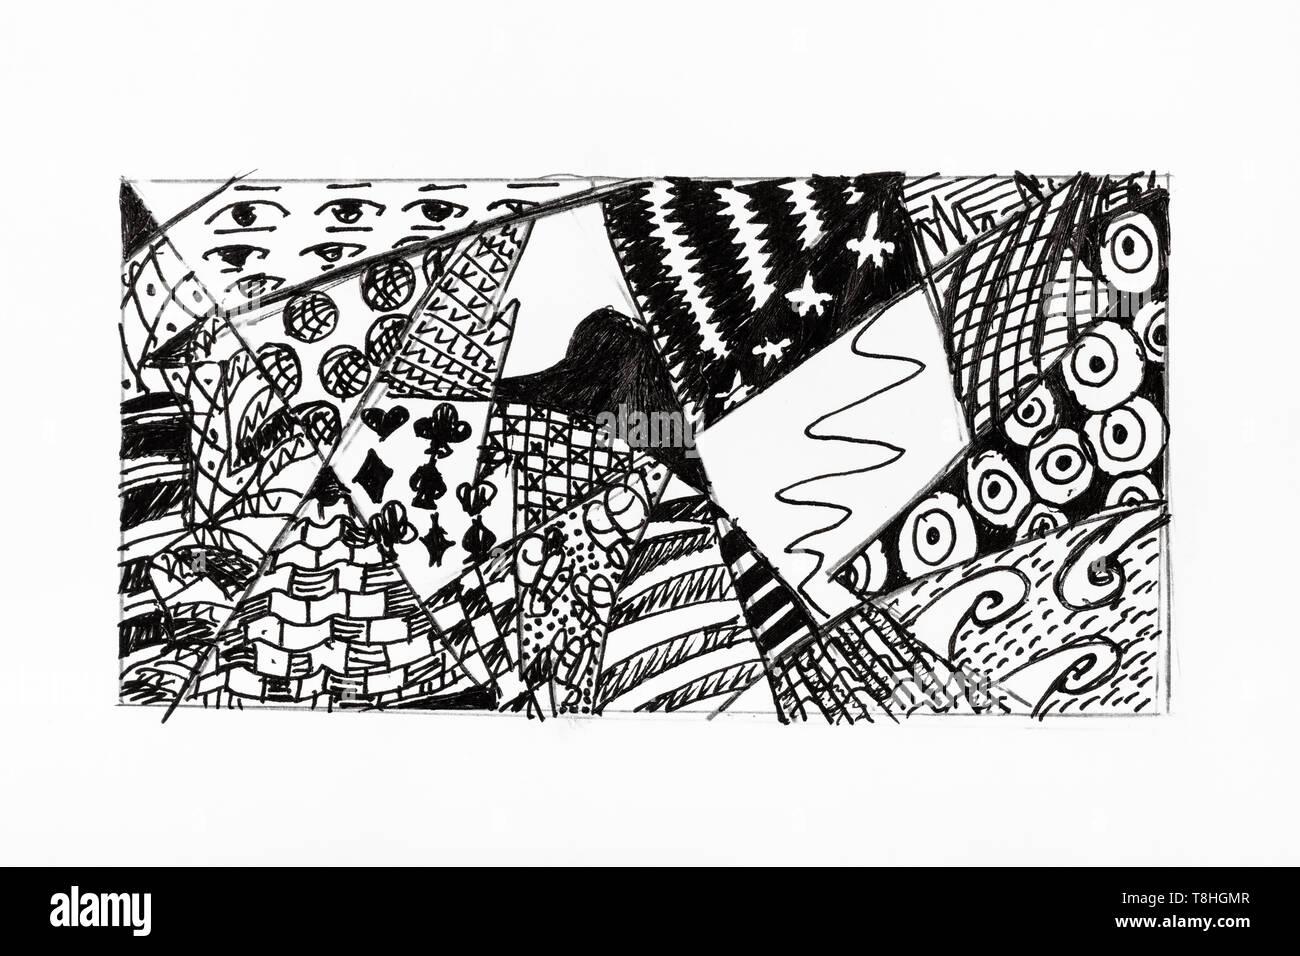 Ornamento abstracto dibujado a mano con tinta negra en papel blanco Foto de stock